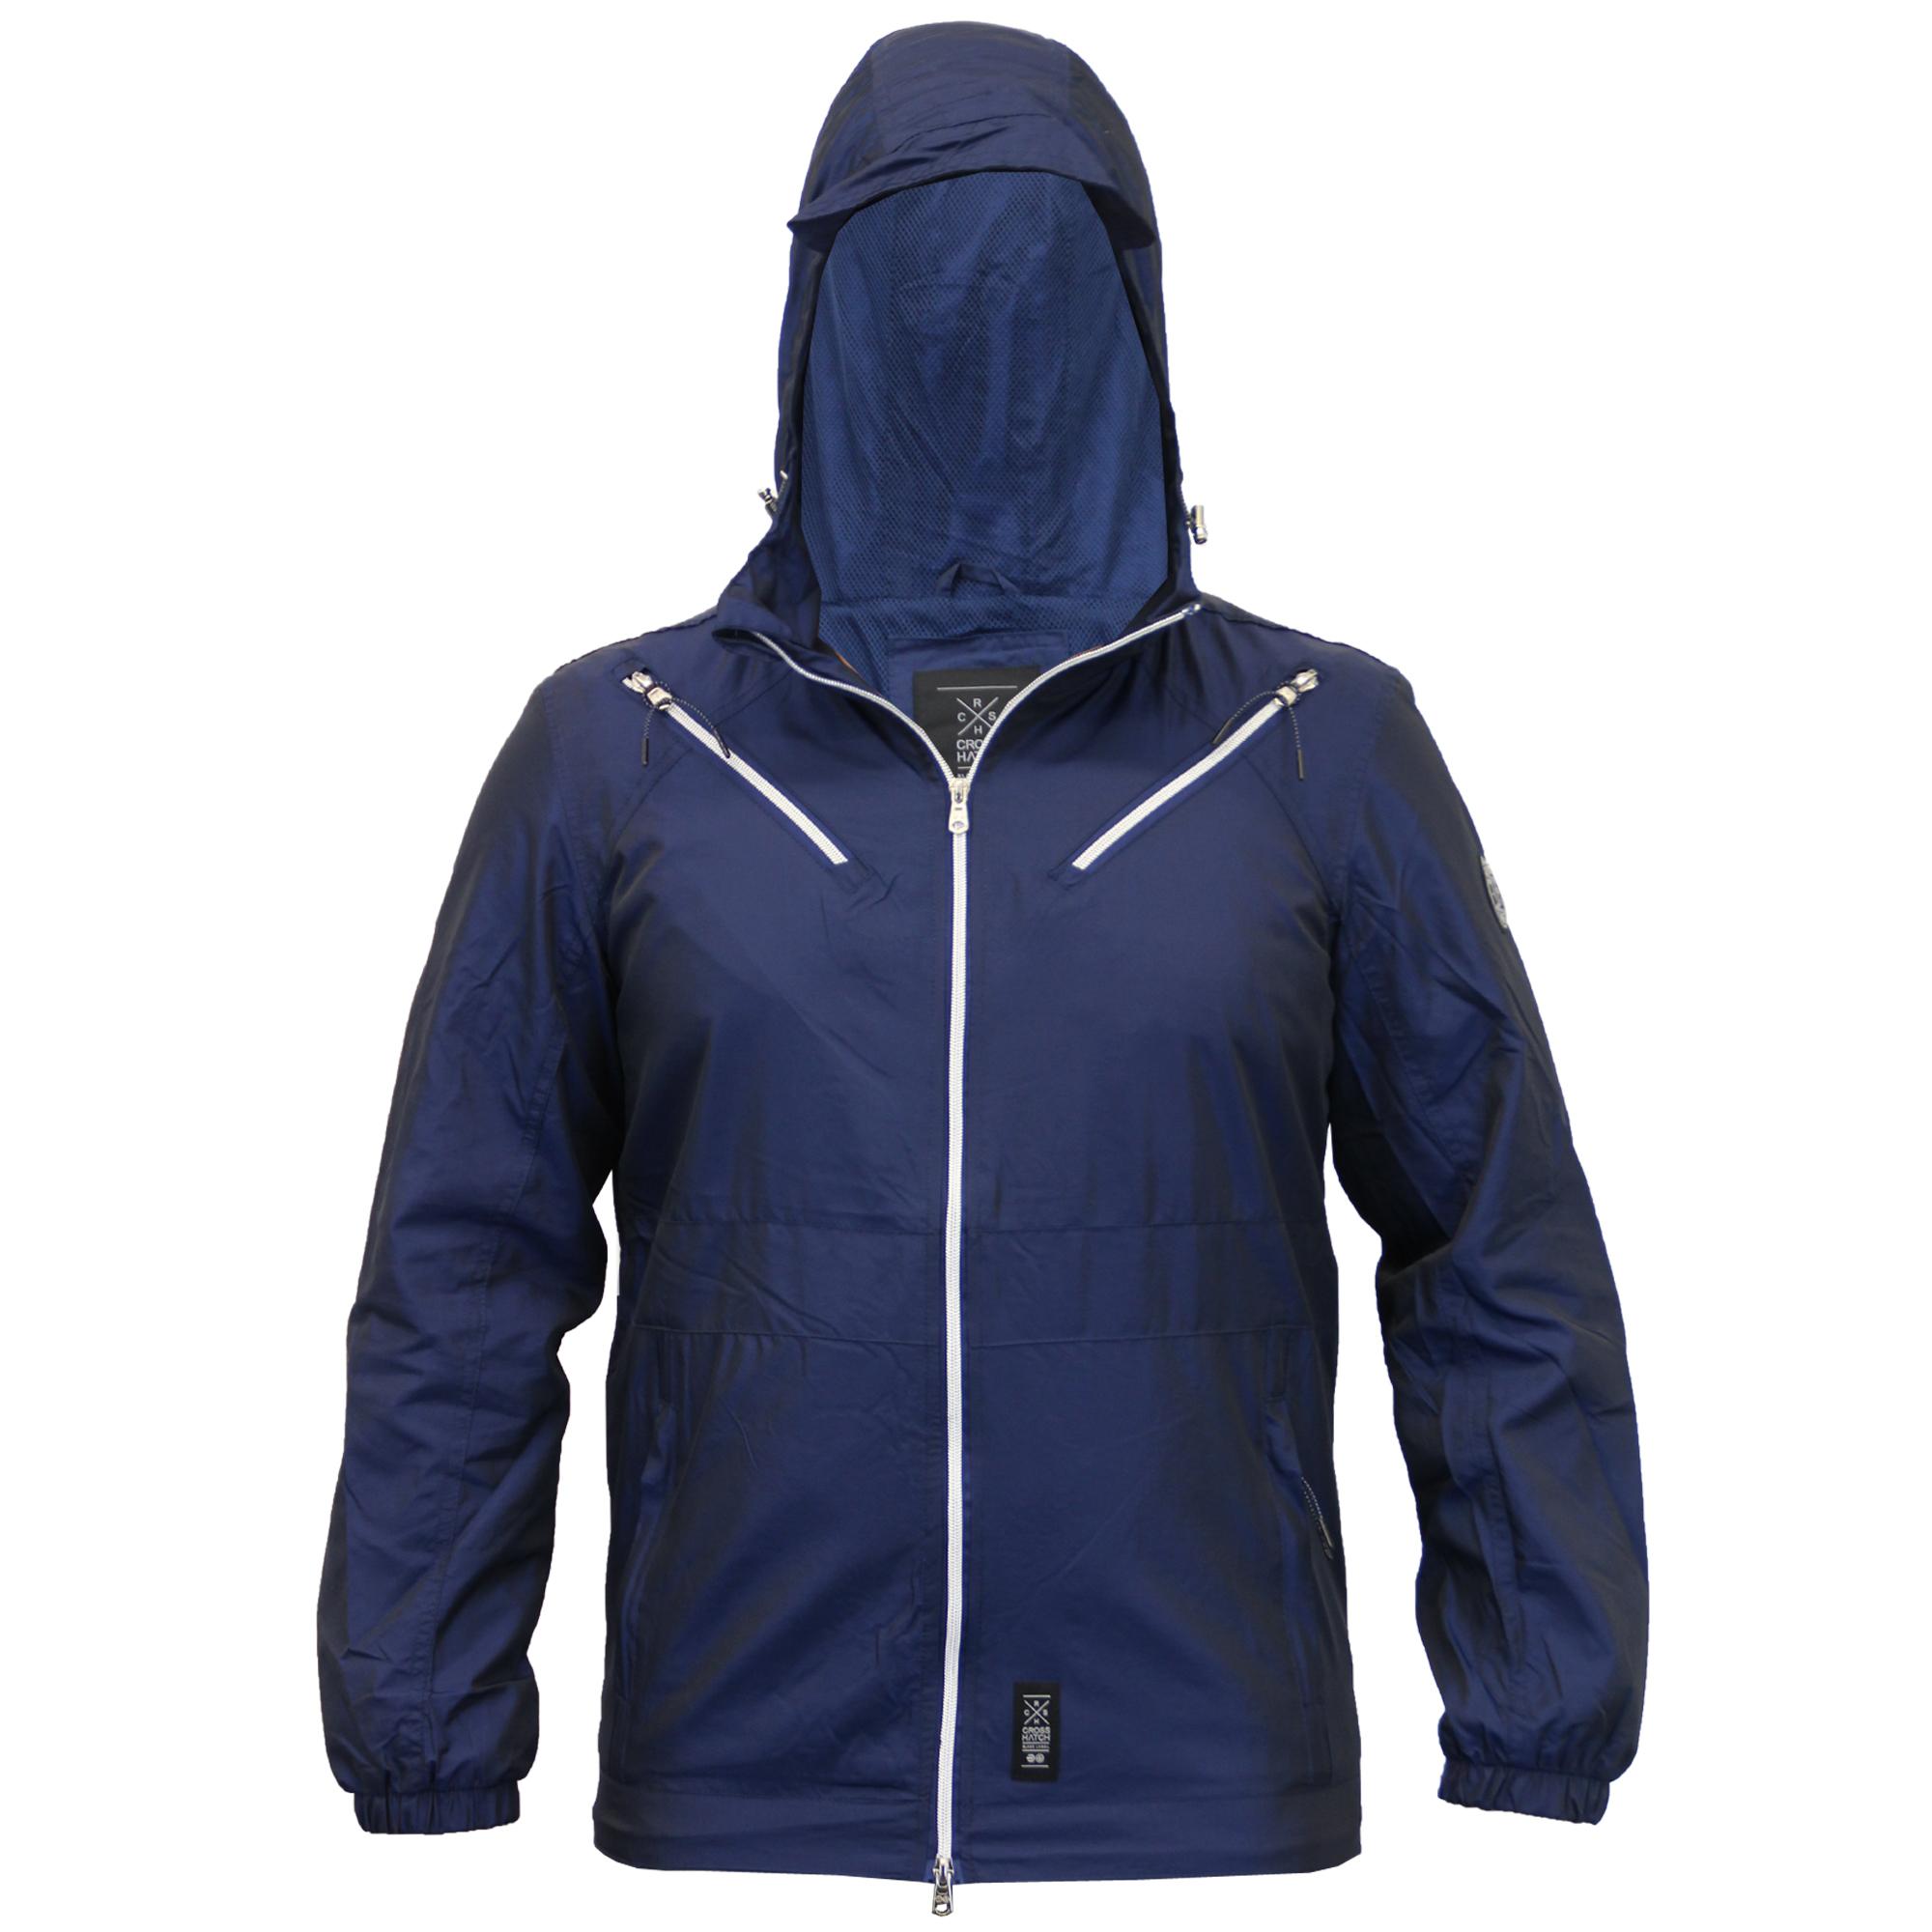 Mens-Windbreaker-Jacket-Crosshatch-Coat-Hooded-Mesh-Lined-Zip-Casual-Summer-New thumbnail 7